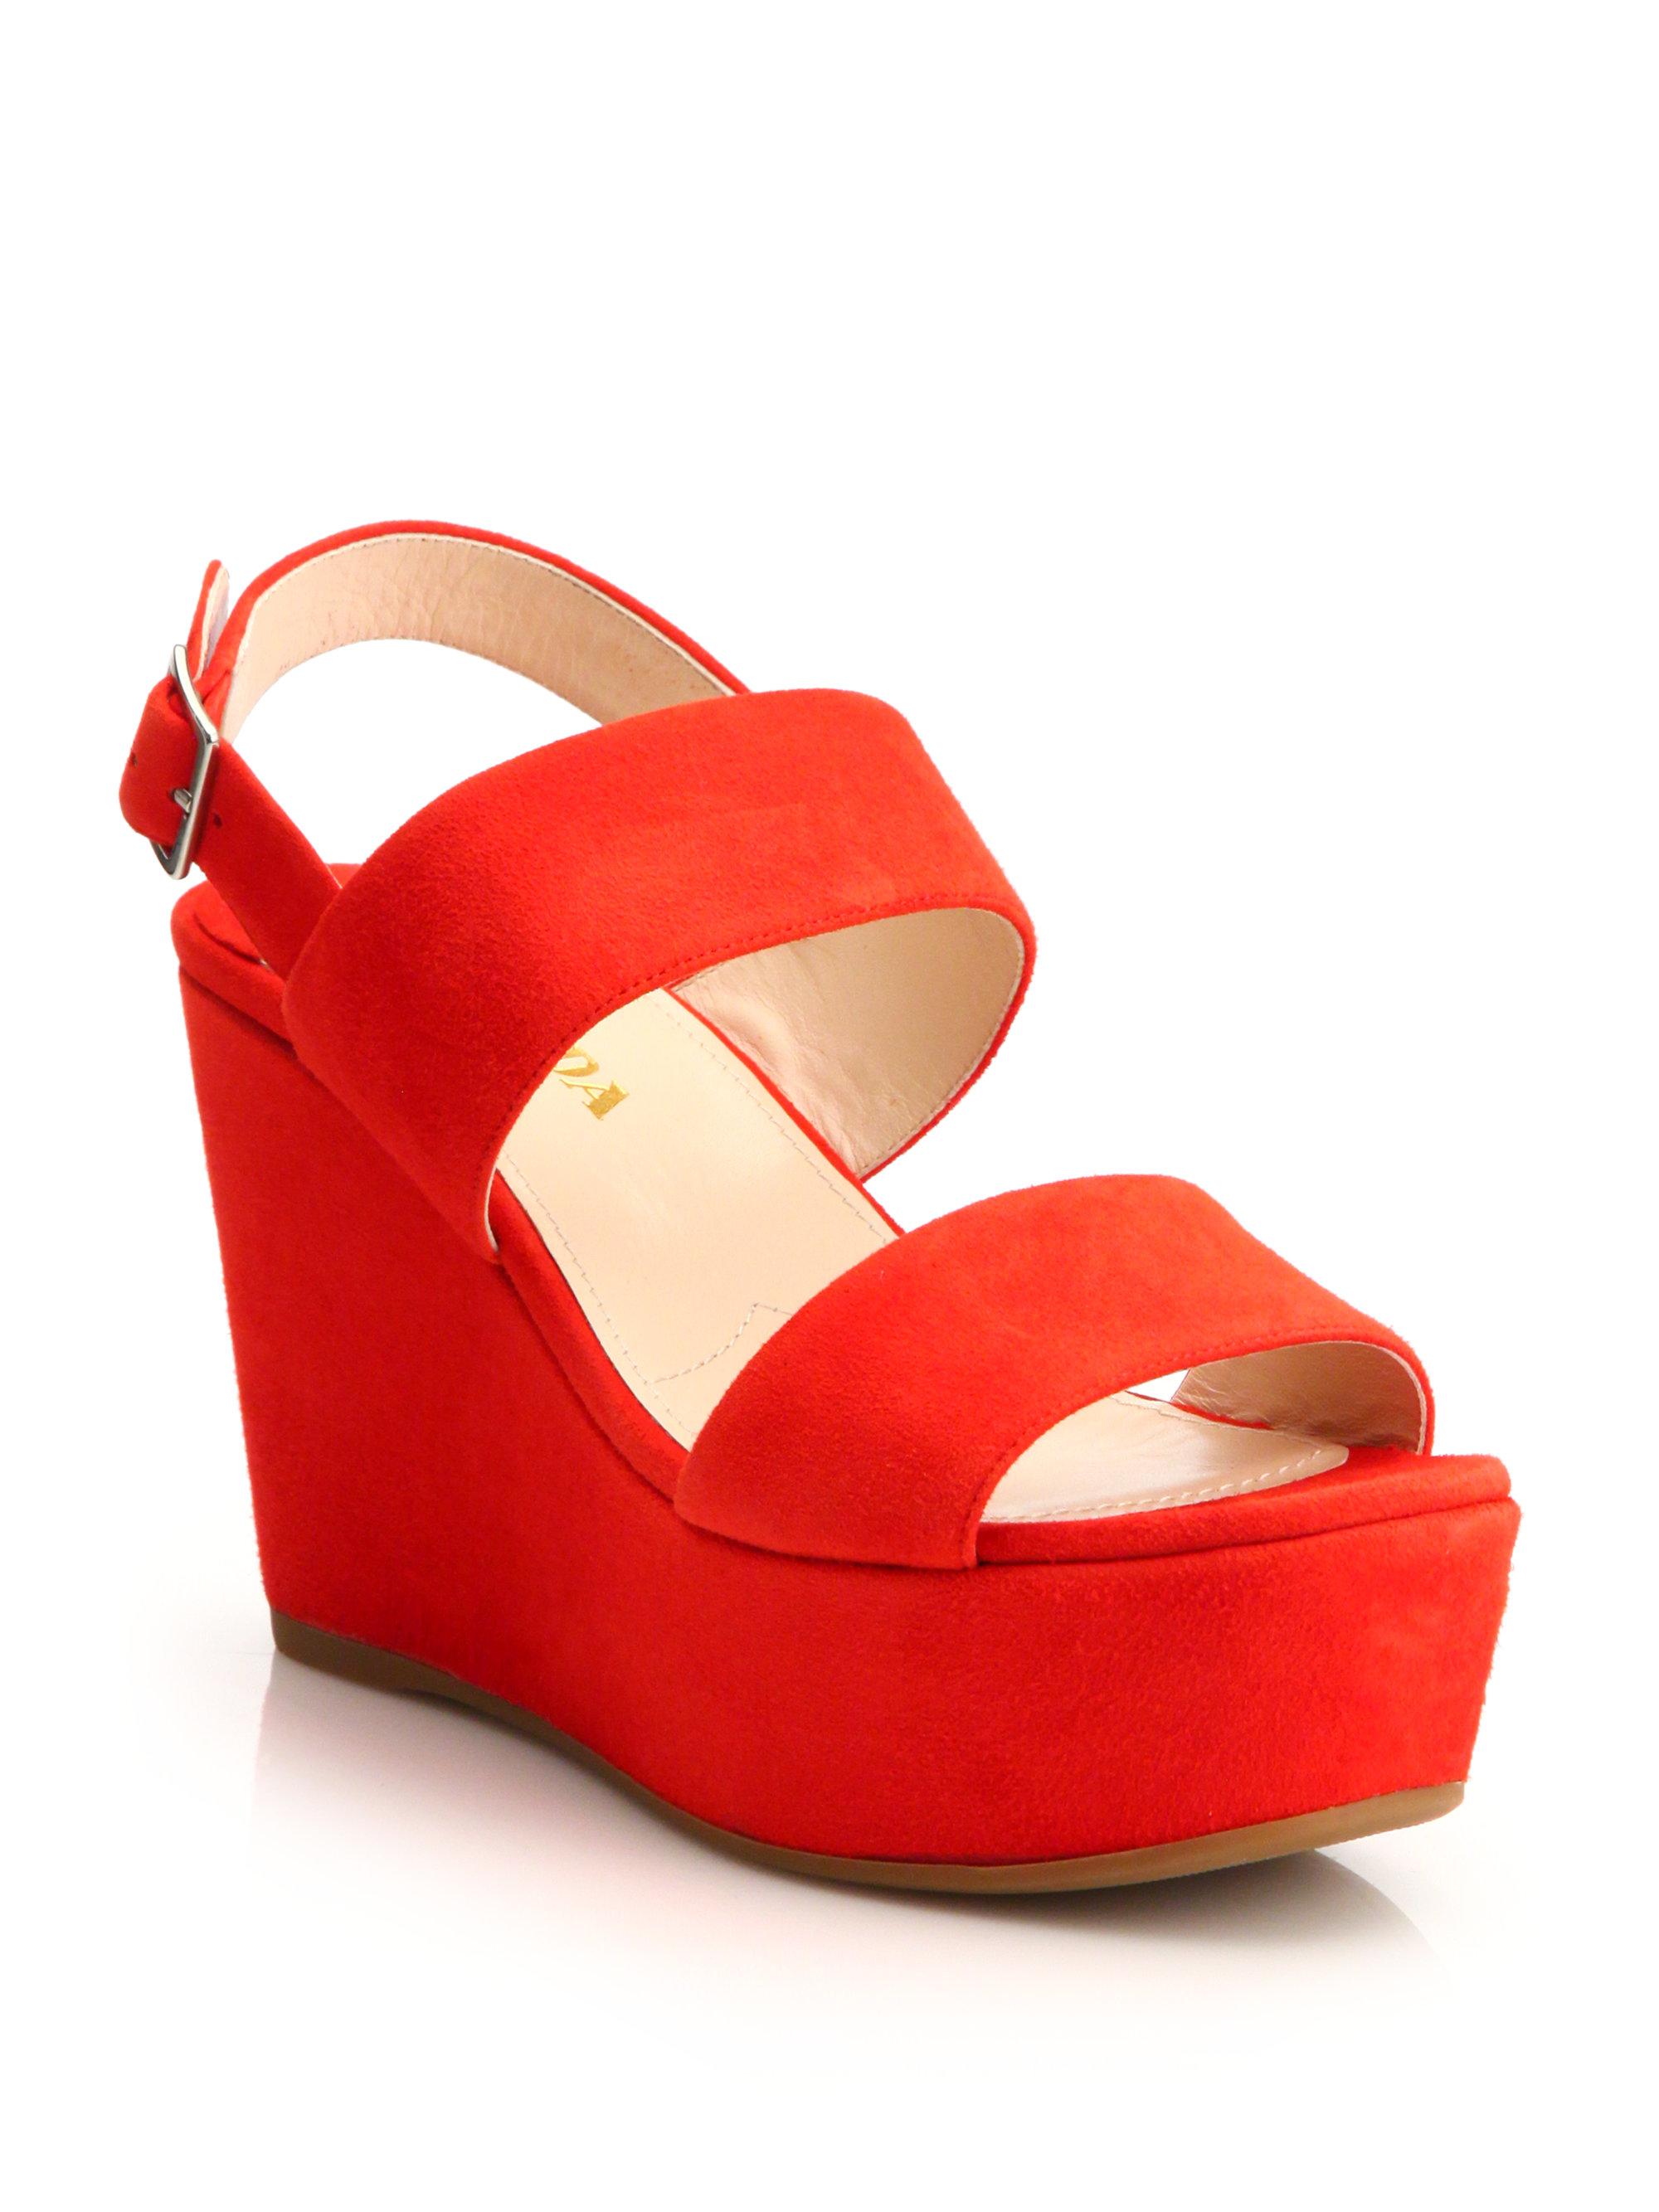 1b9ff20da99 Lyst - Prada Suede Platform Wedge Sandals in Red